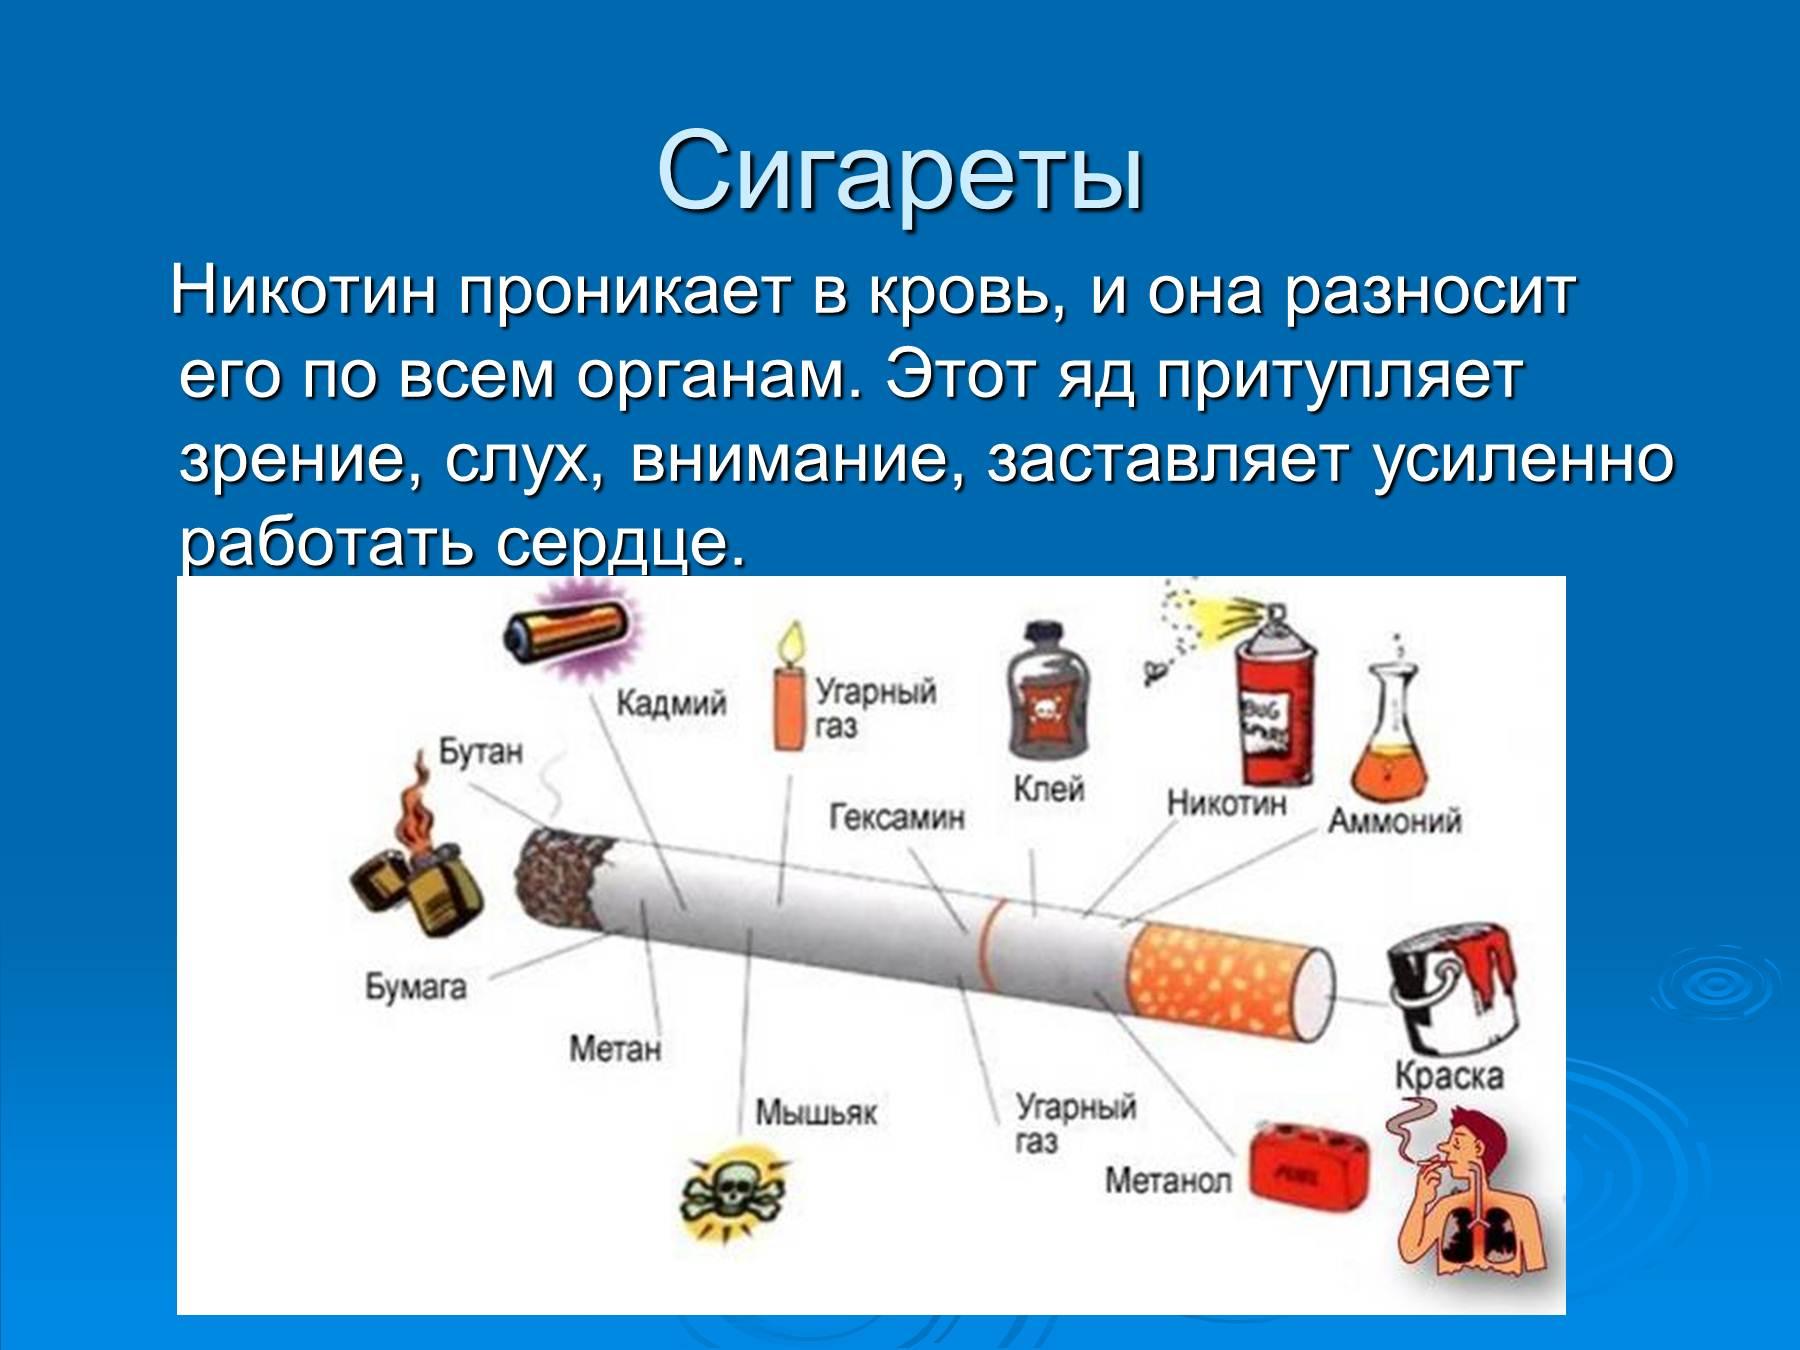 Презентация курение картинки